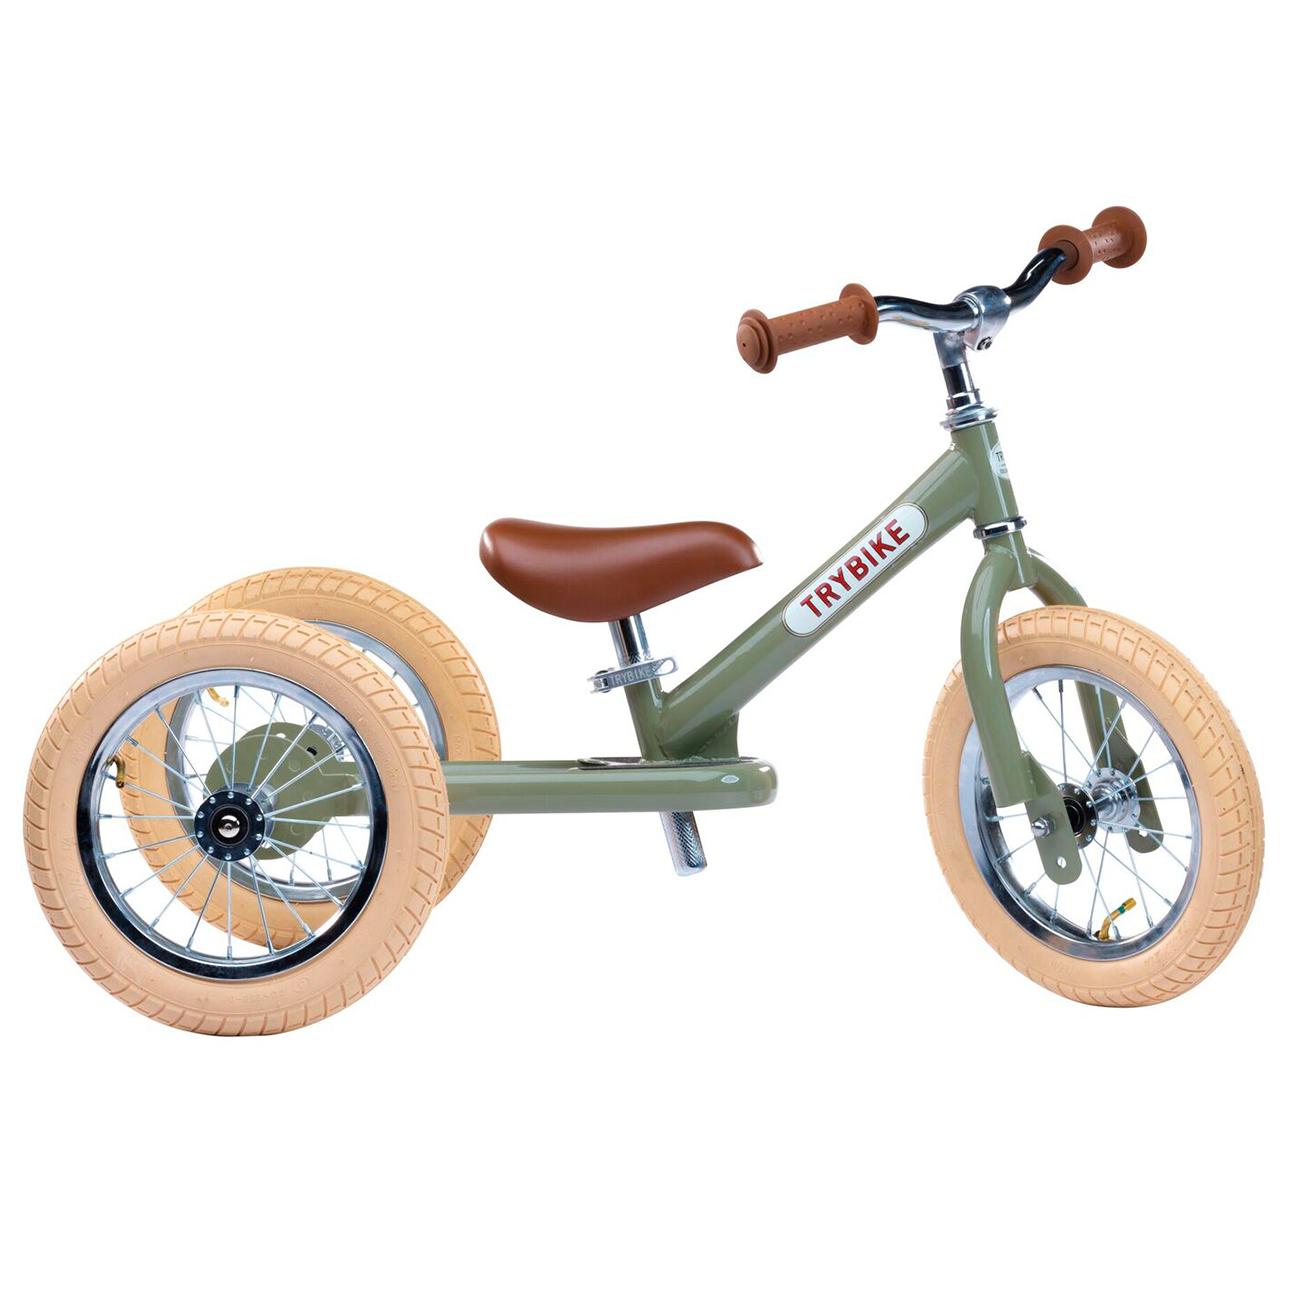 Trybike - 3 hjulet Løbecykel, Vintage grøn | løbecykel og løbehjul